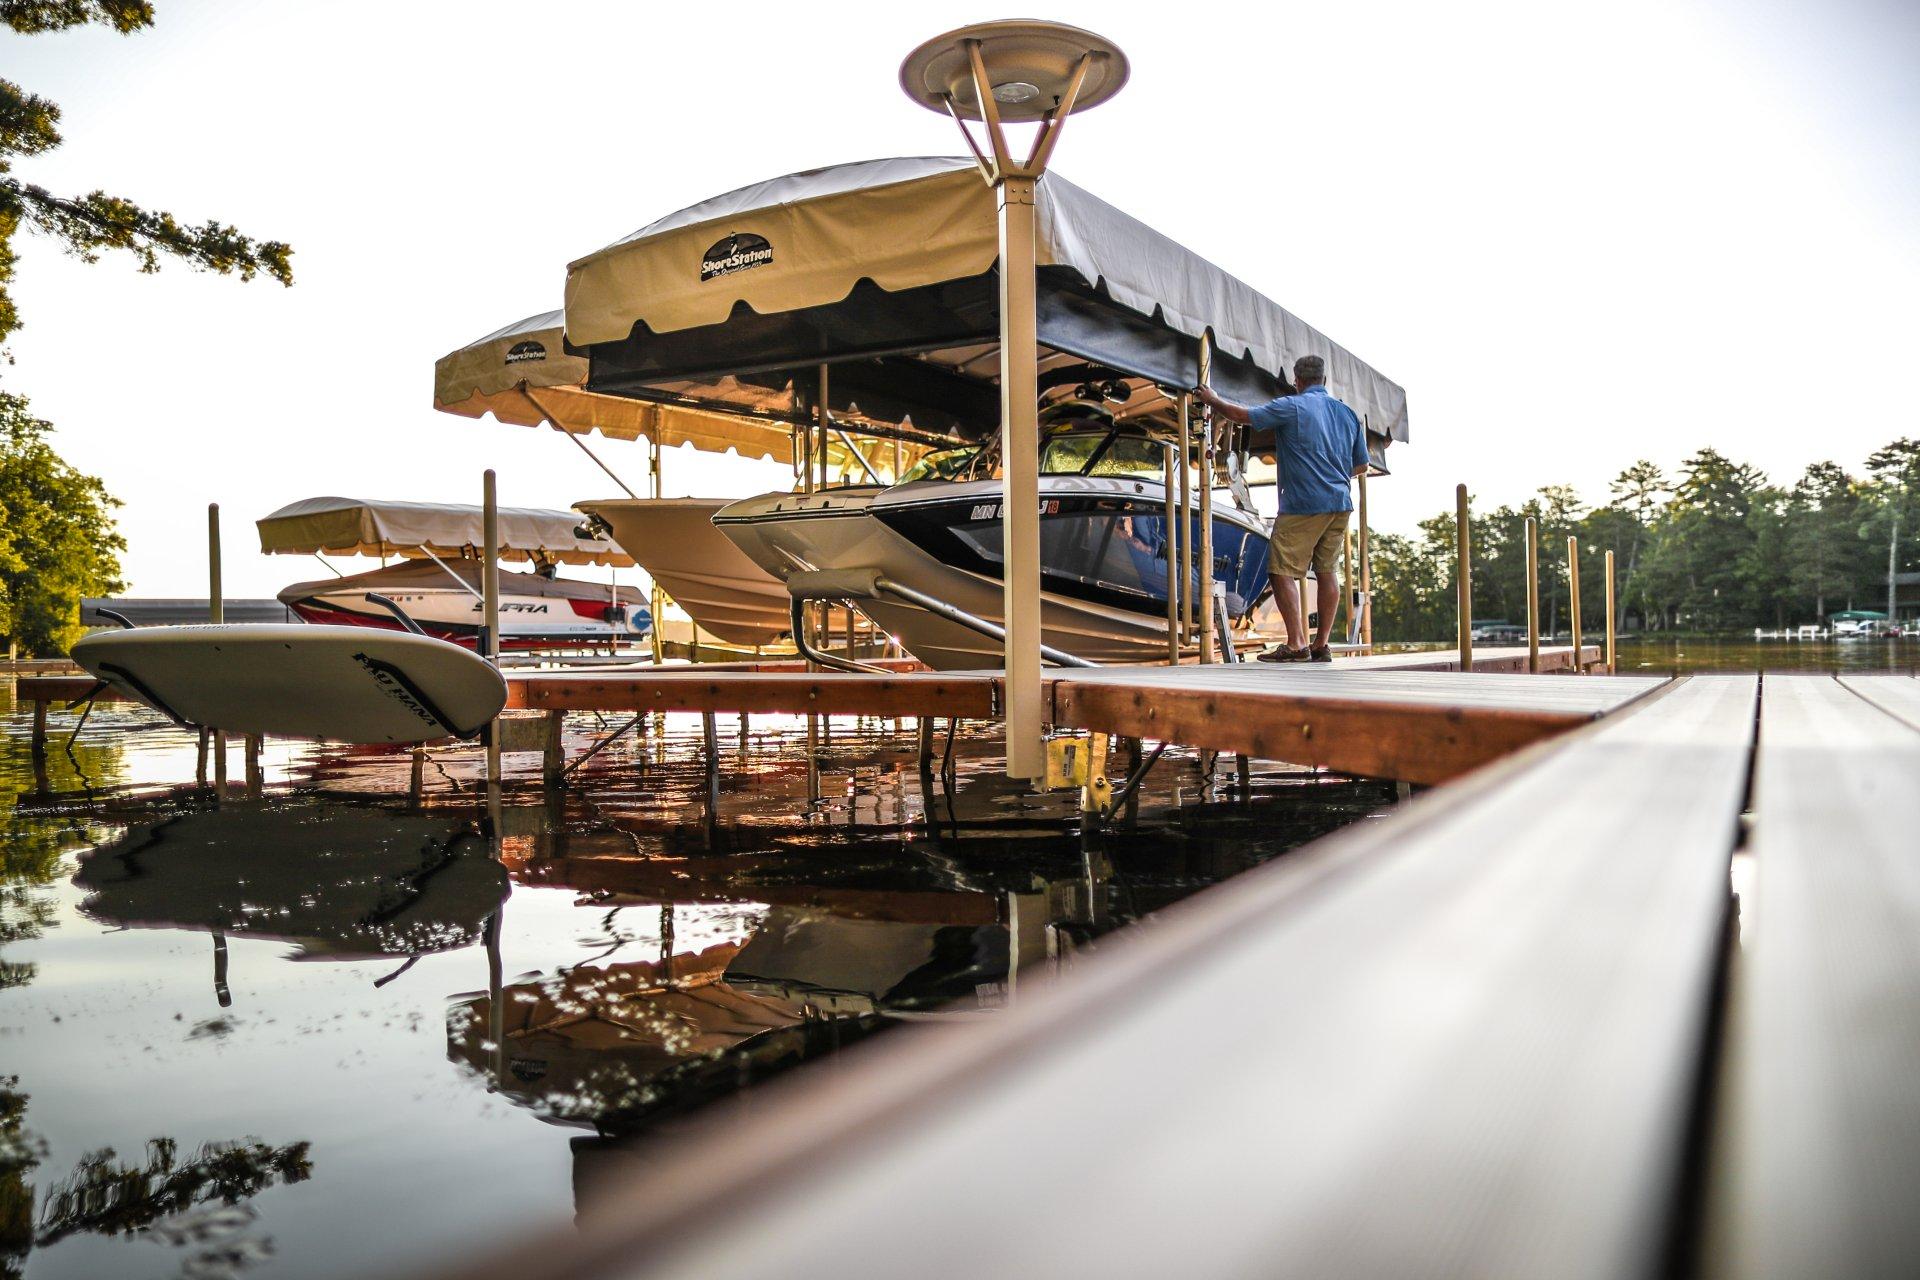 Shorestation Boat Lifts – Shoco Marine